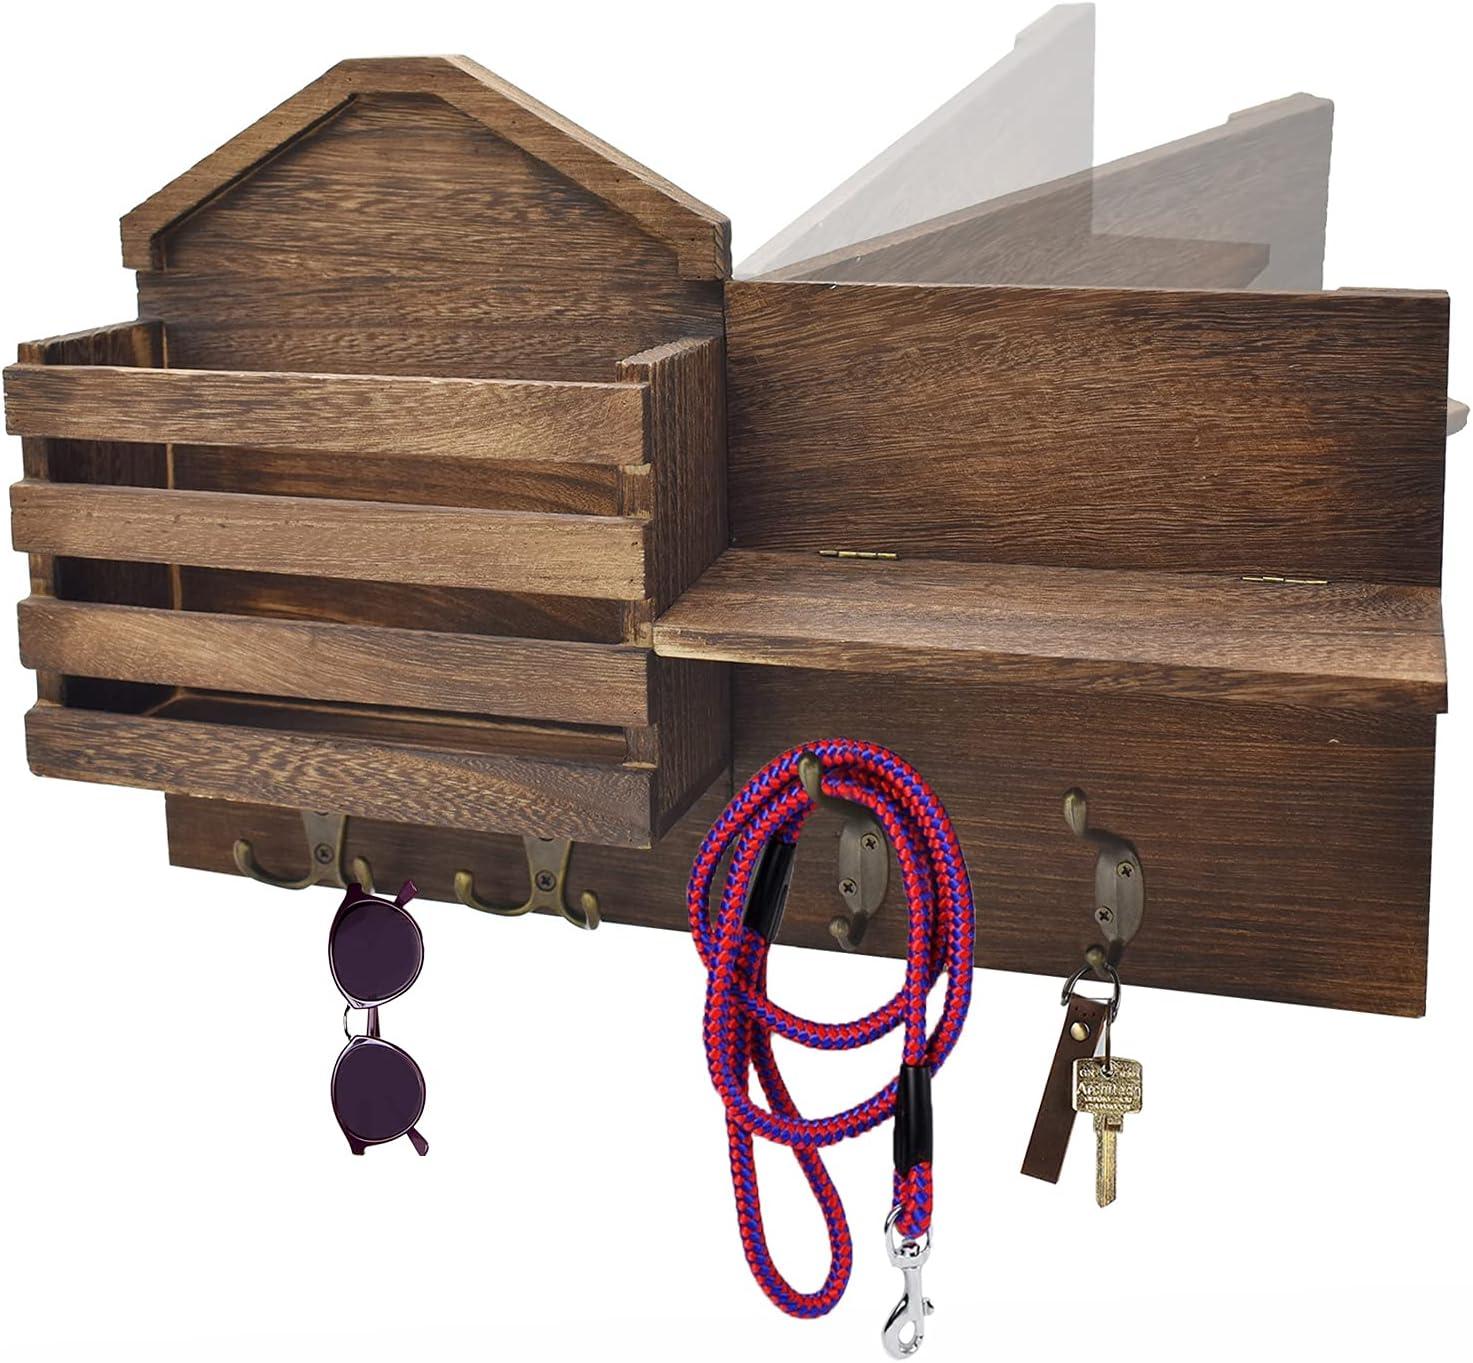 Key Mail Holder Wall Mount Envelope Wooden Lowest price challenge Mounted Spring new work Fol Organizer